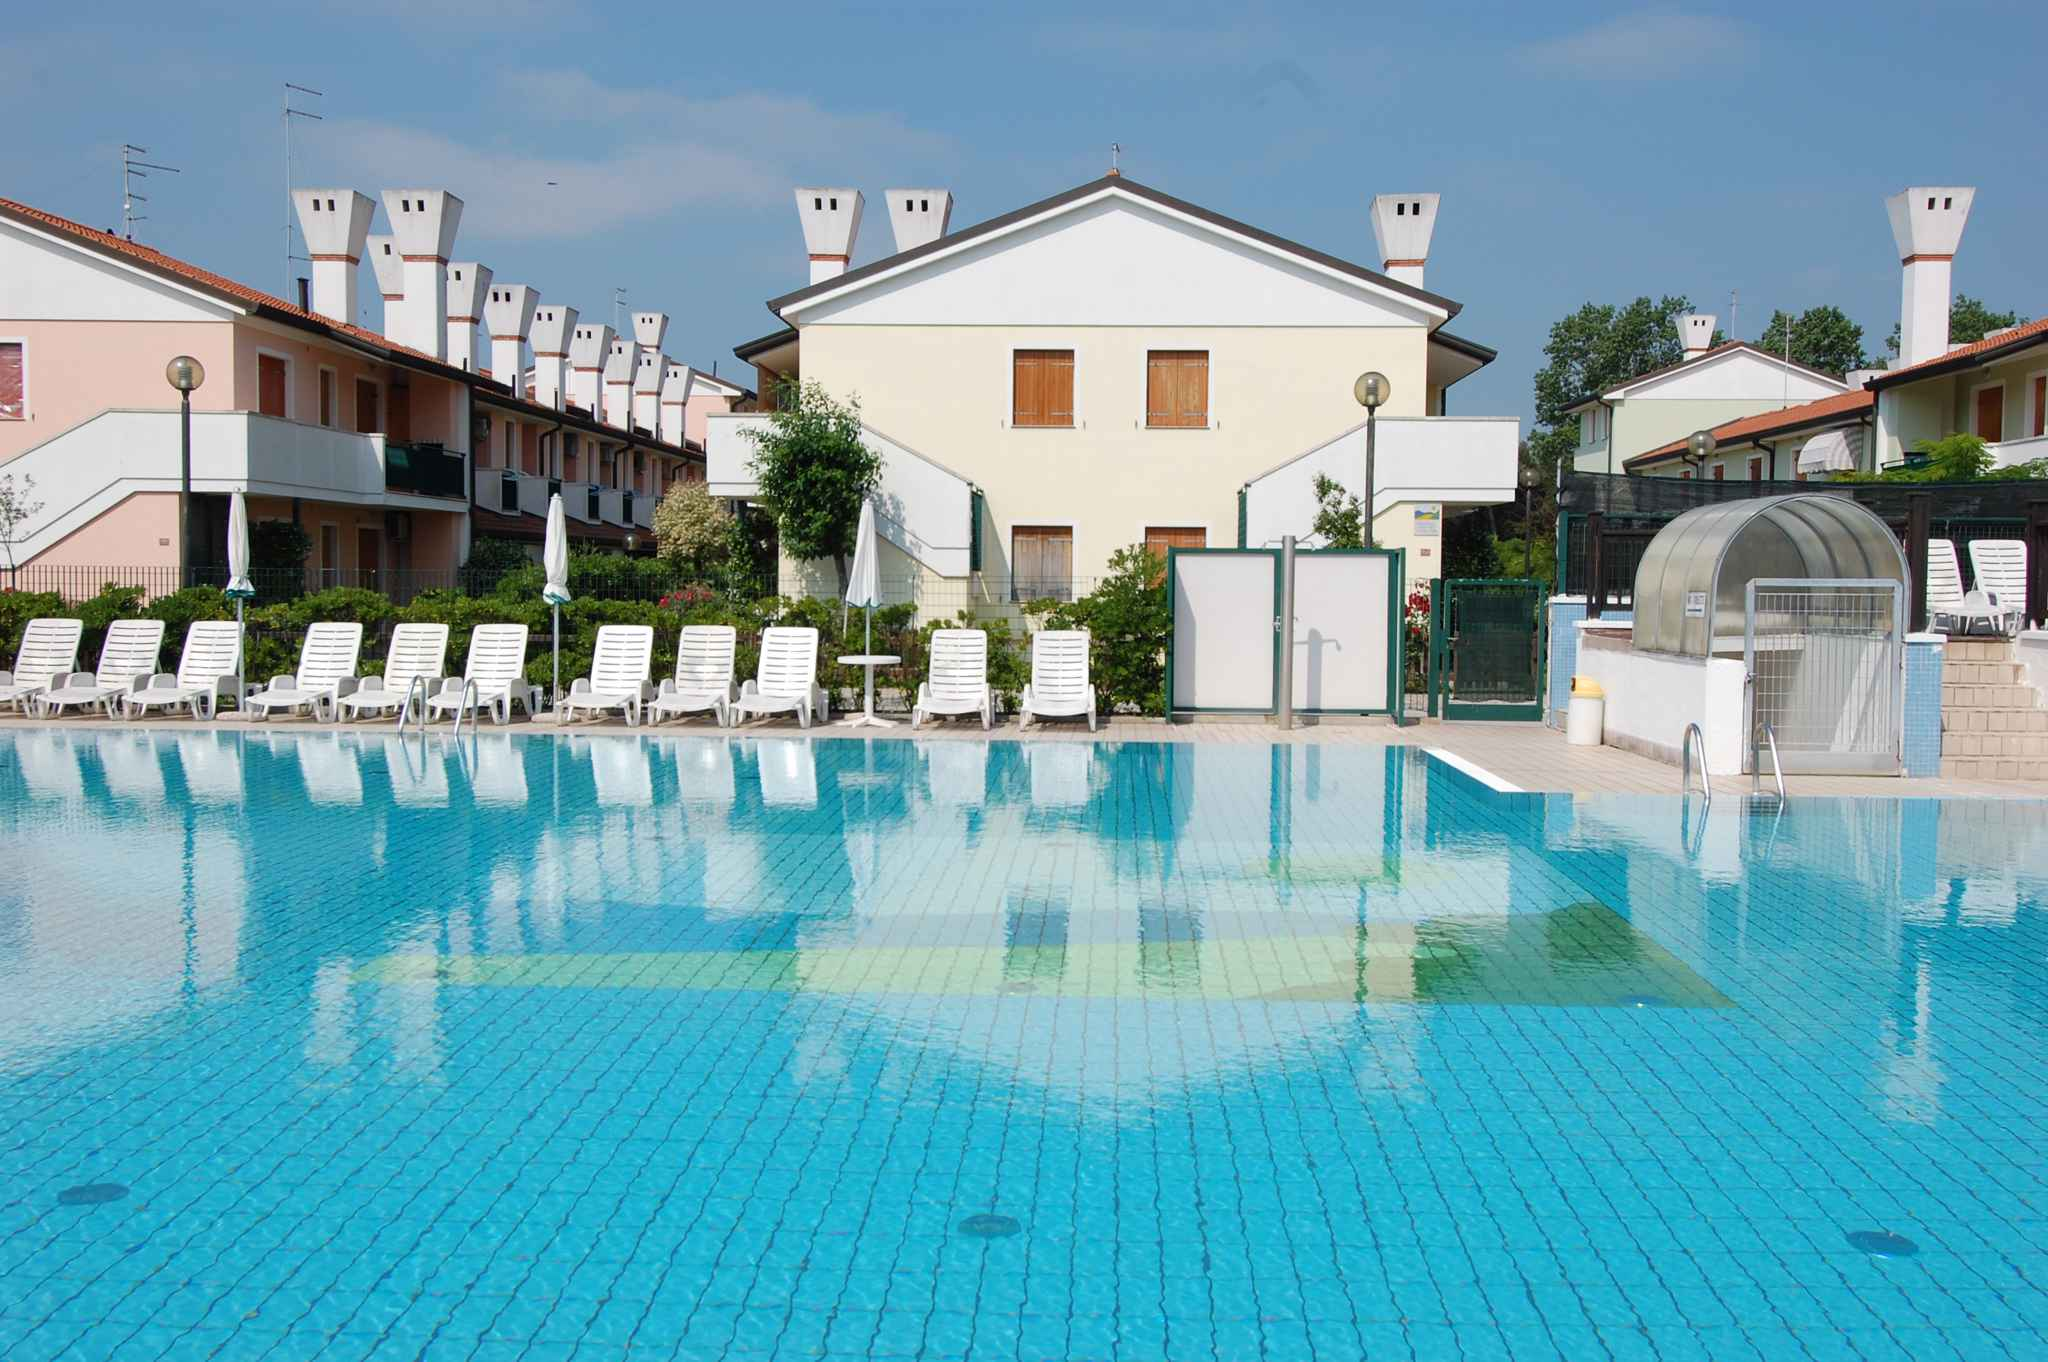 Ferienhaus mit Pool und Grill (284304), Rosolina Mare, Rovigo, Venetien, Italien, Bild 8